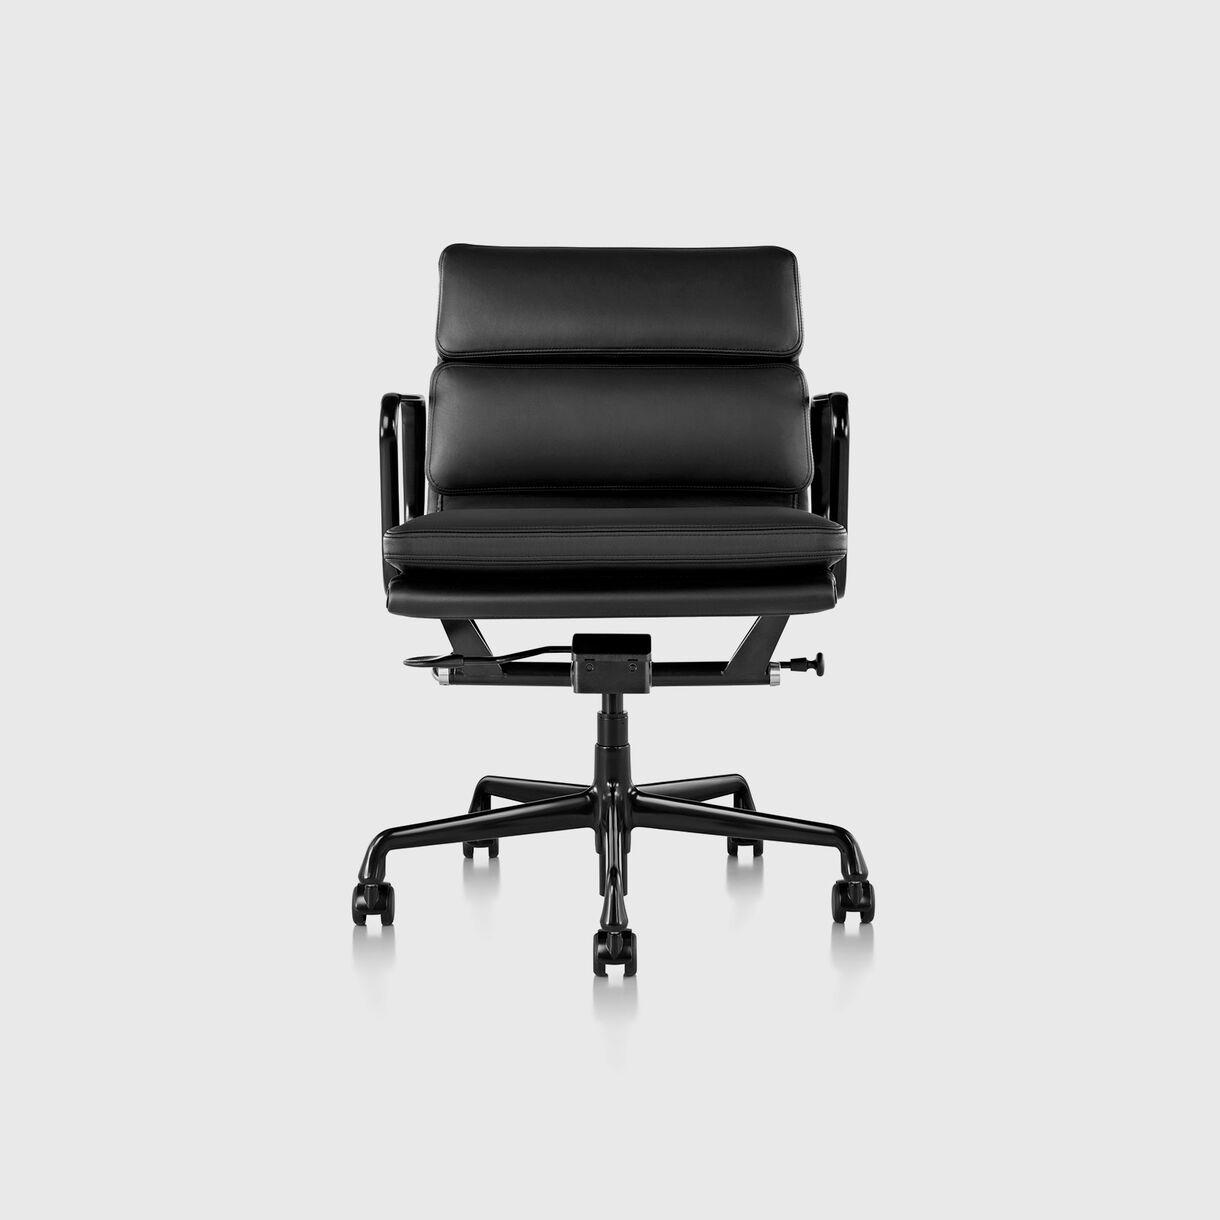 Eames Soft Pad Management Chair, Pneumatic, Black Frame & Black Leather